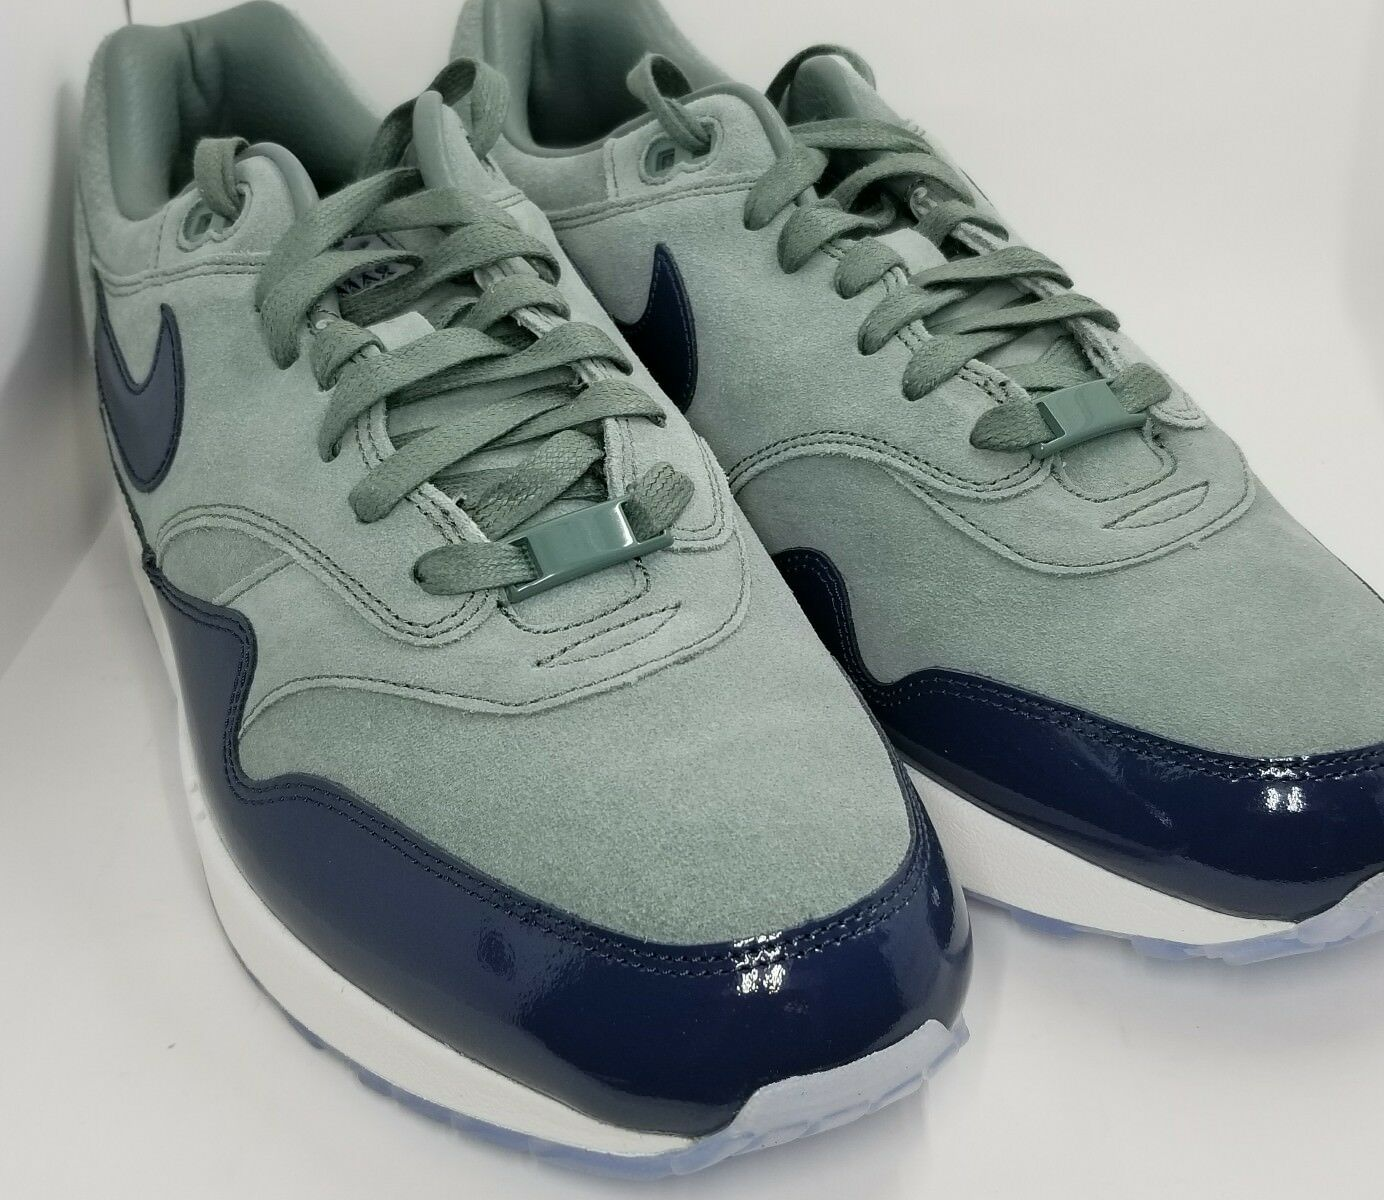 Nike Air Max 1 Premium Suede ID SIZE 12 Ar1379-991